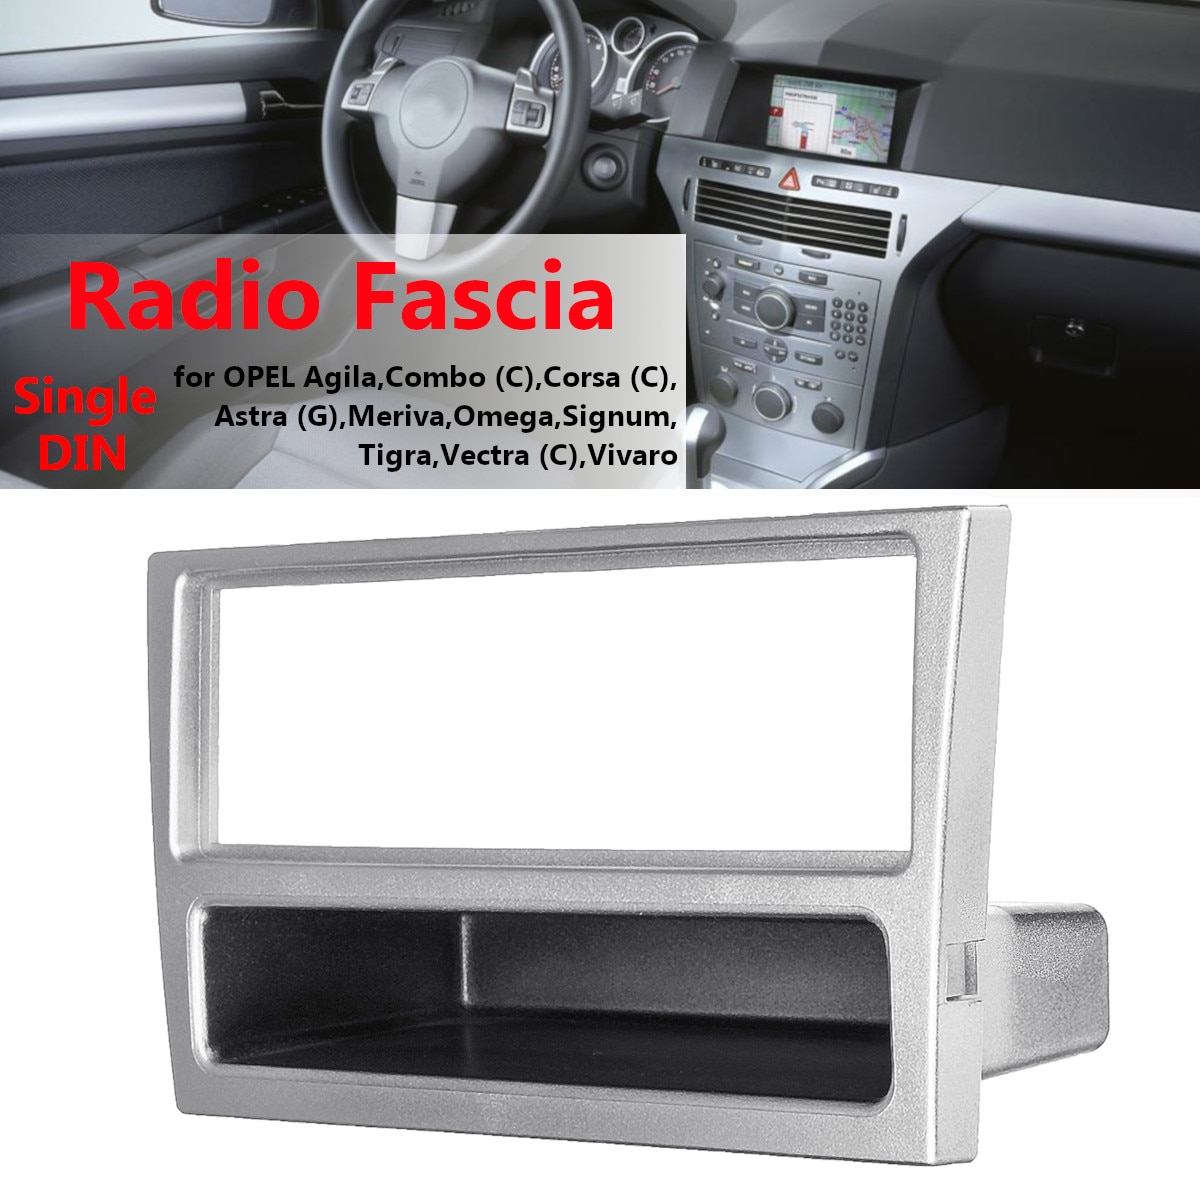 1 Din Car Stereo Radio Fascia Panel Plate Frame for OPEL Agila Tigra Astra 2004-2009 Dashboard Panel DVD Player